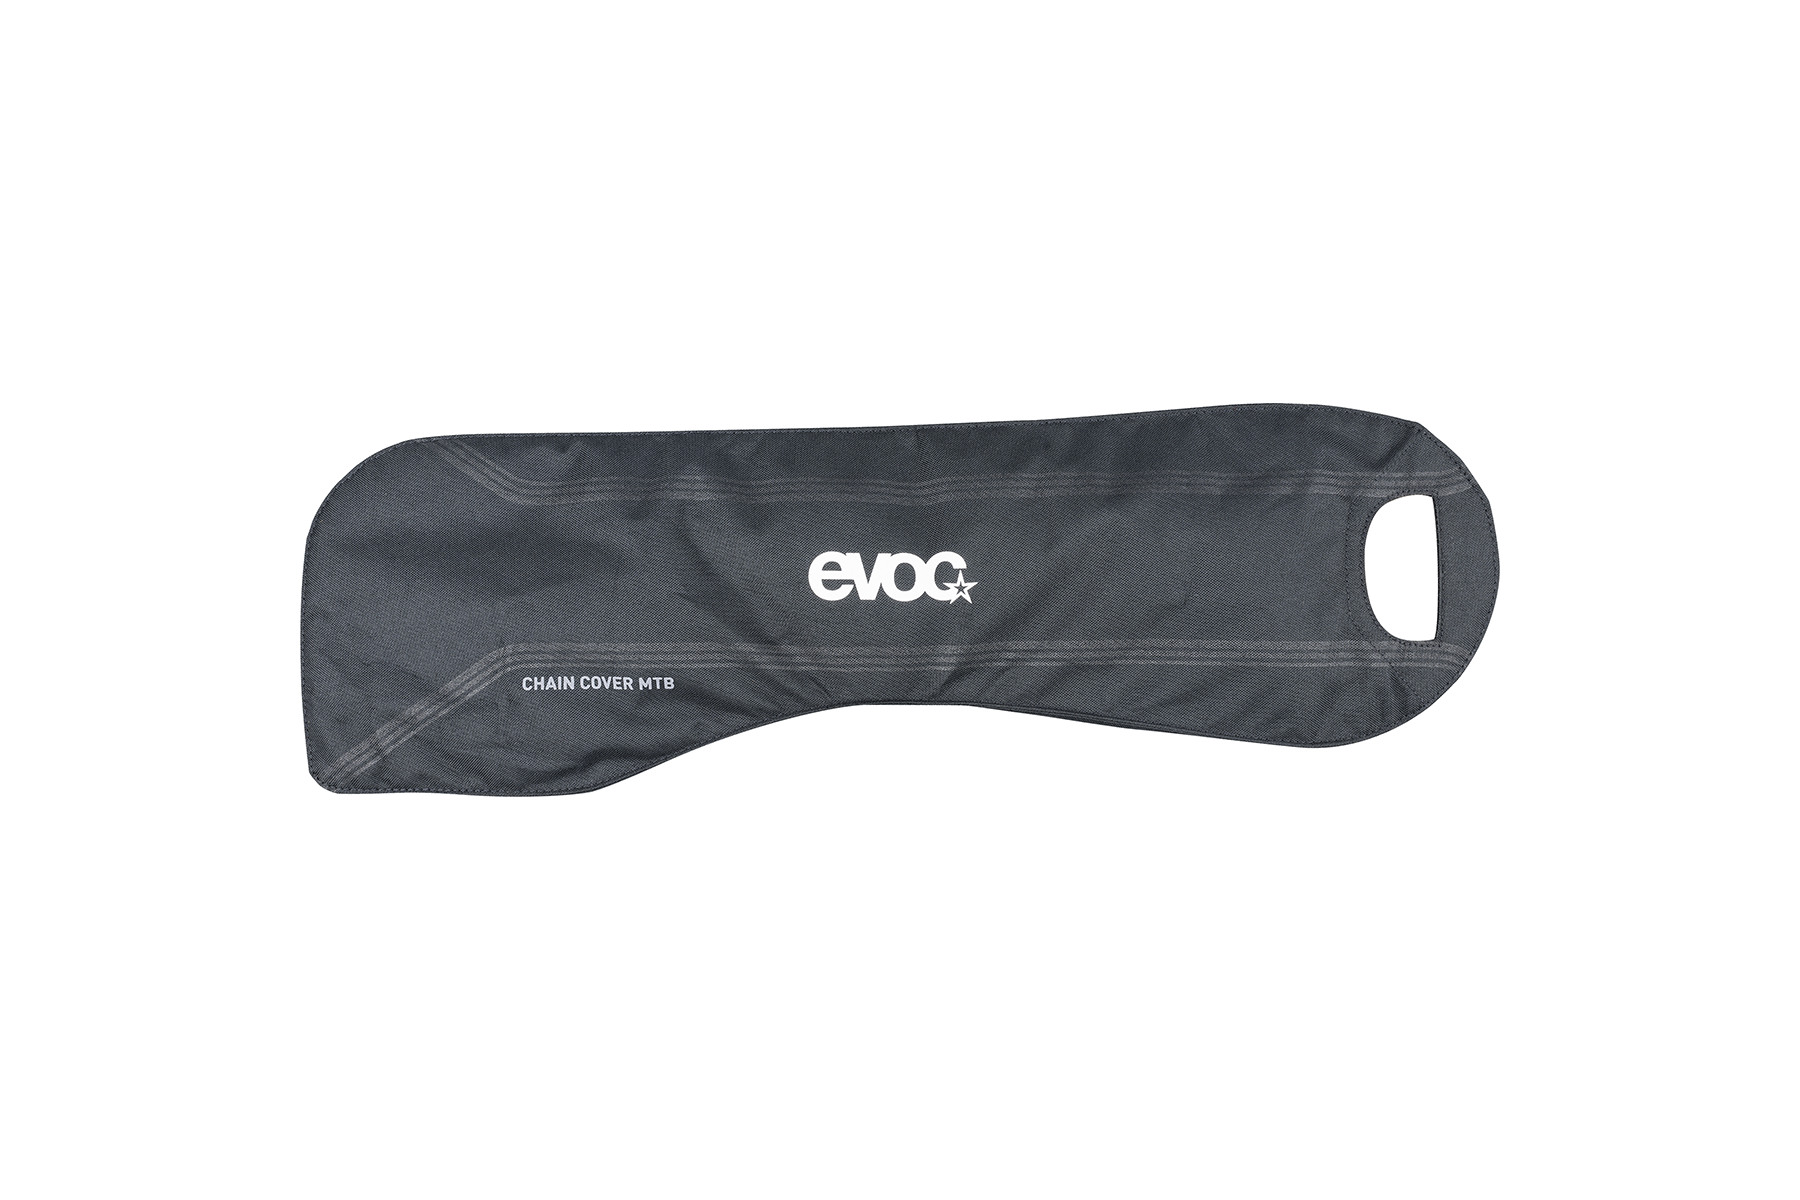 evoc CHAIN COVER MTB Fahrradkettenschutztasche